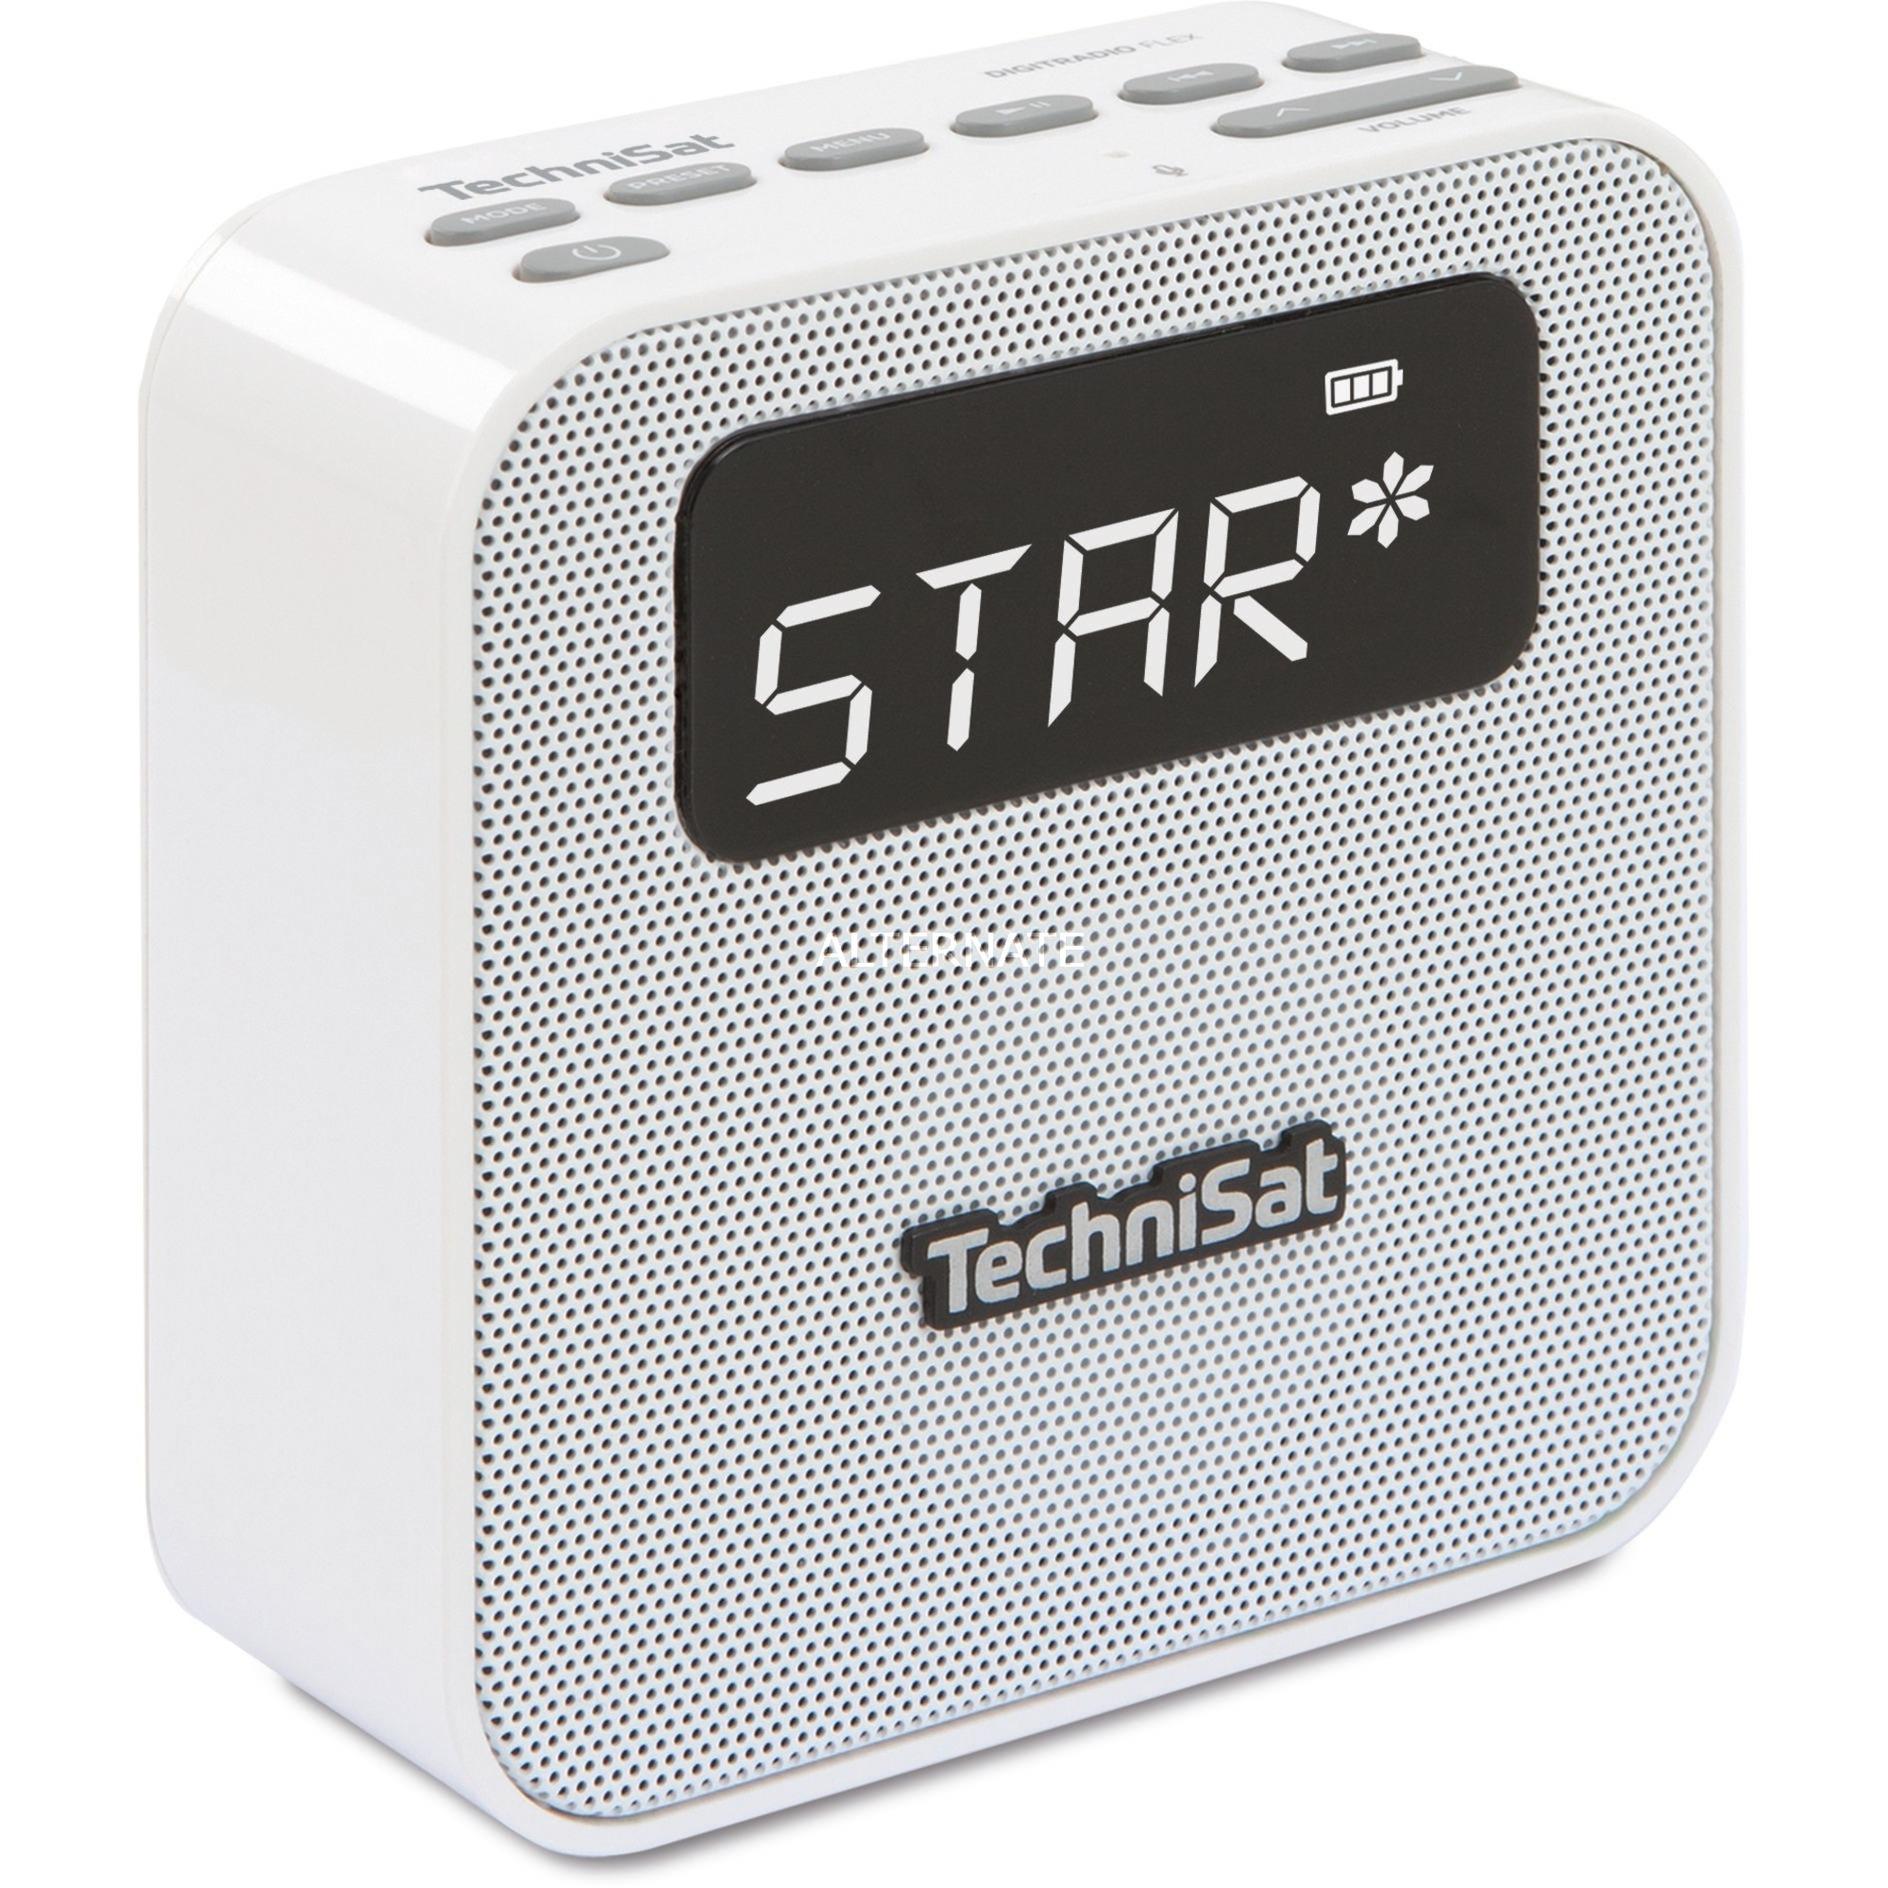 0001/4994 radio Portátil Analógico y digital Plata